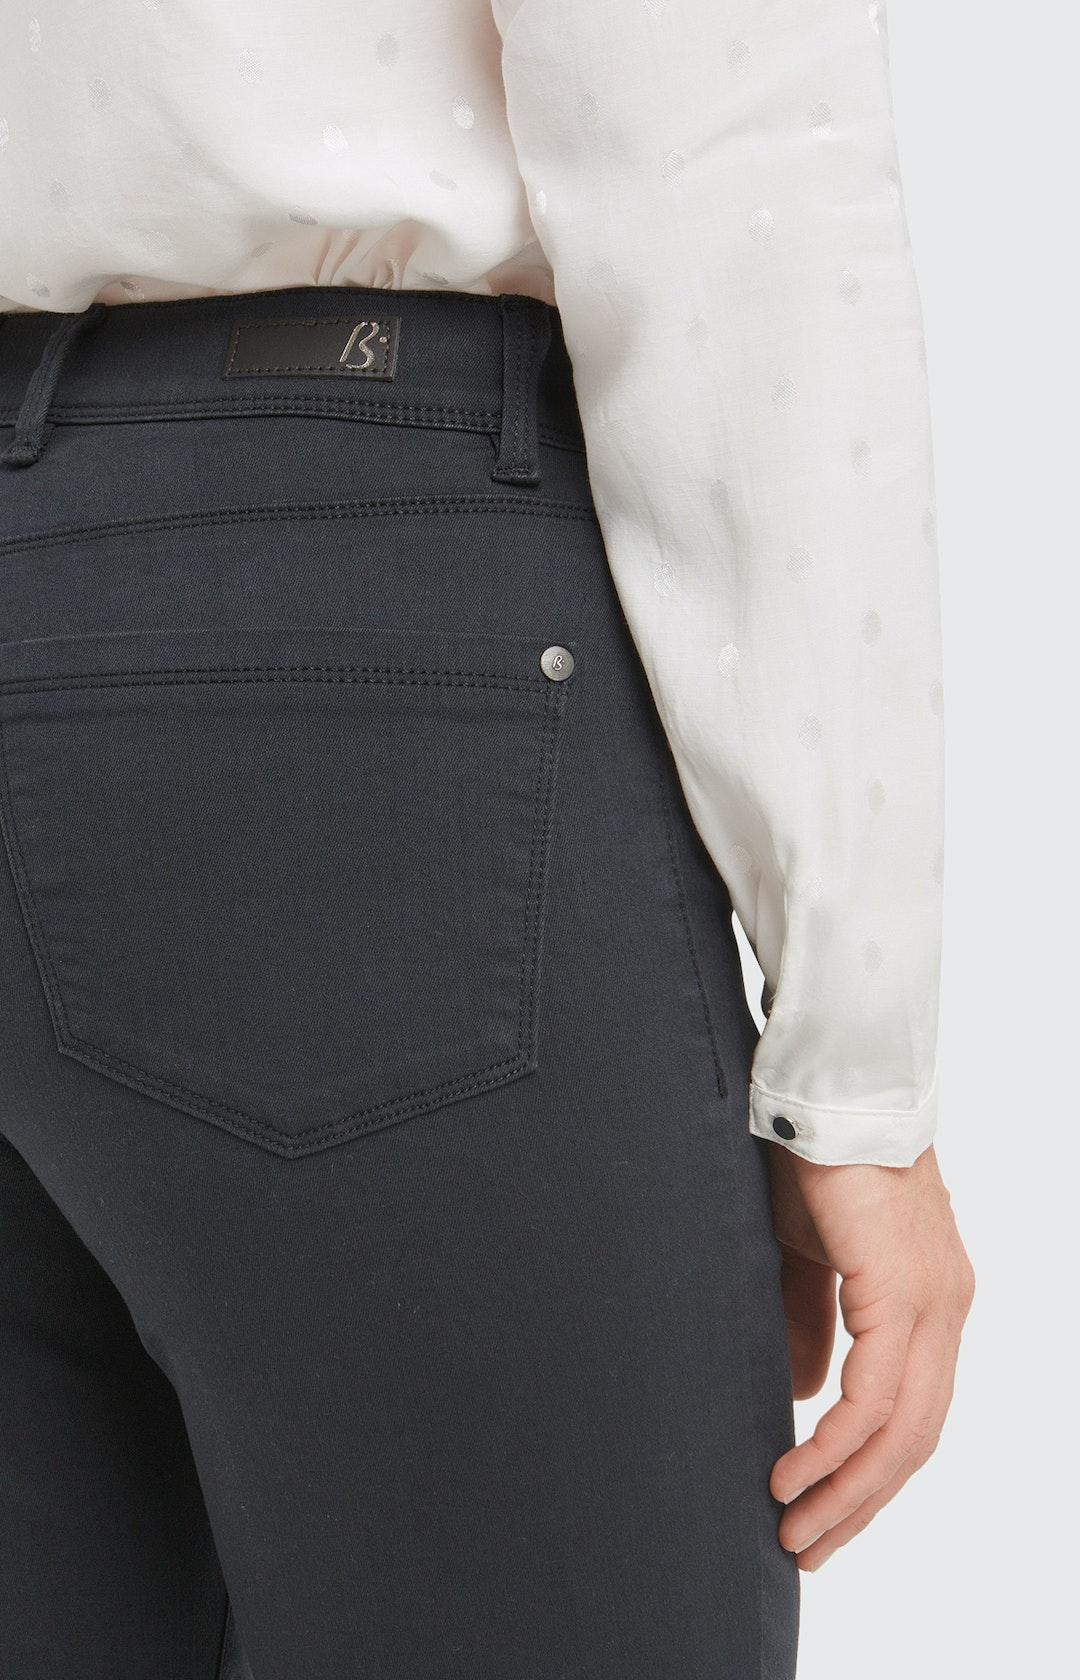 Jeans Doro grau 32inch